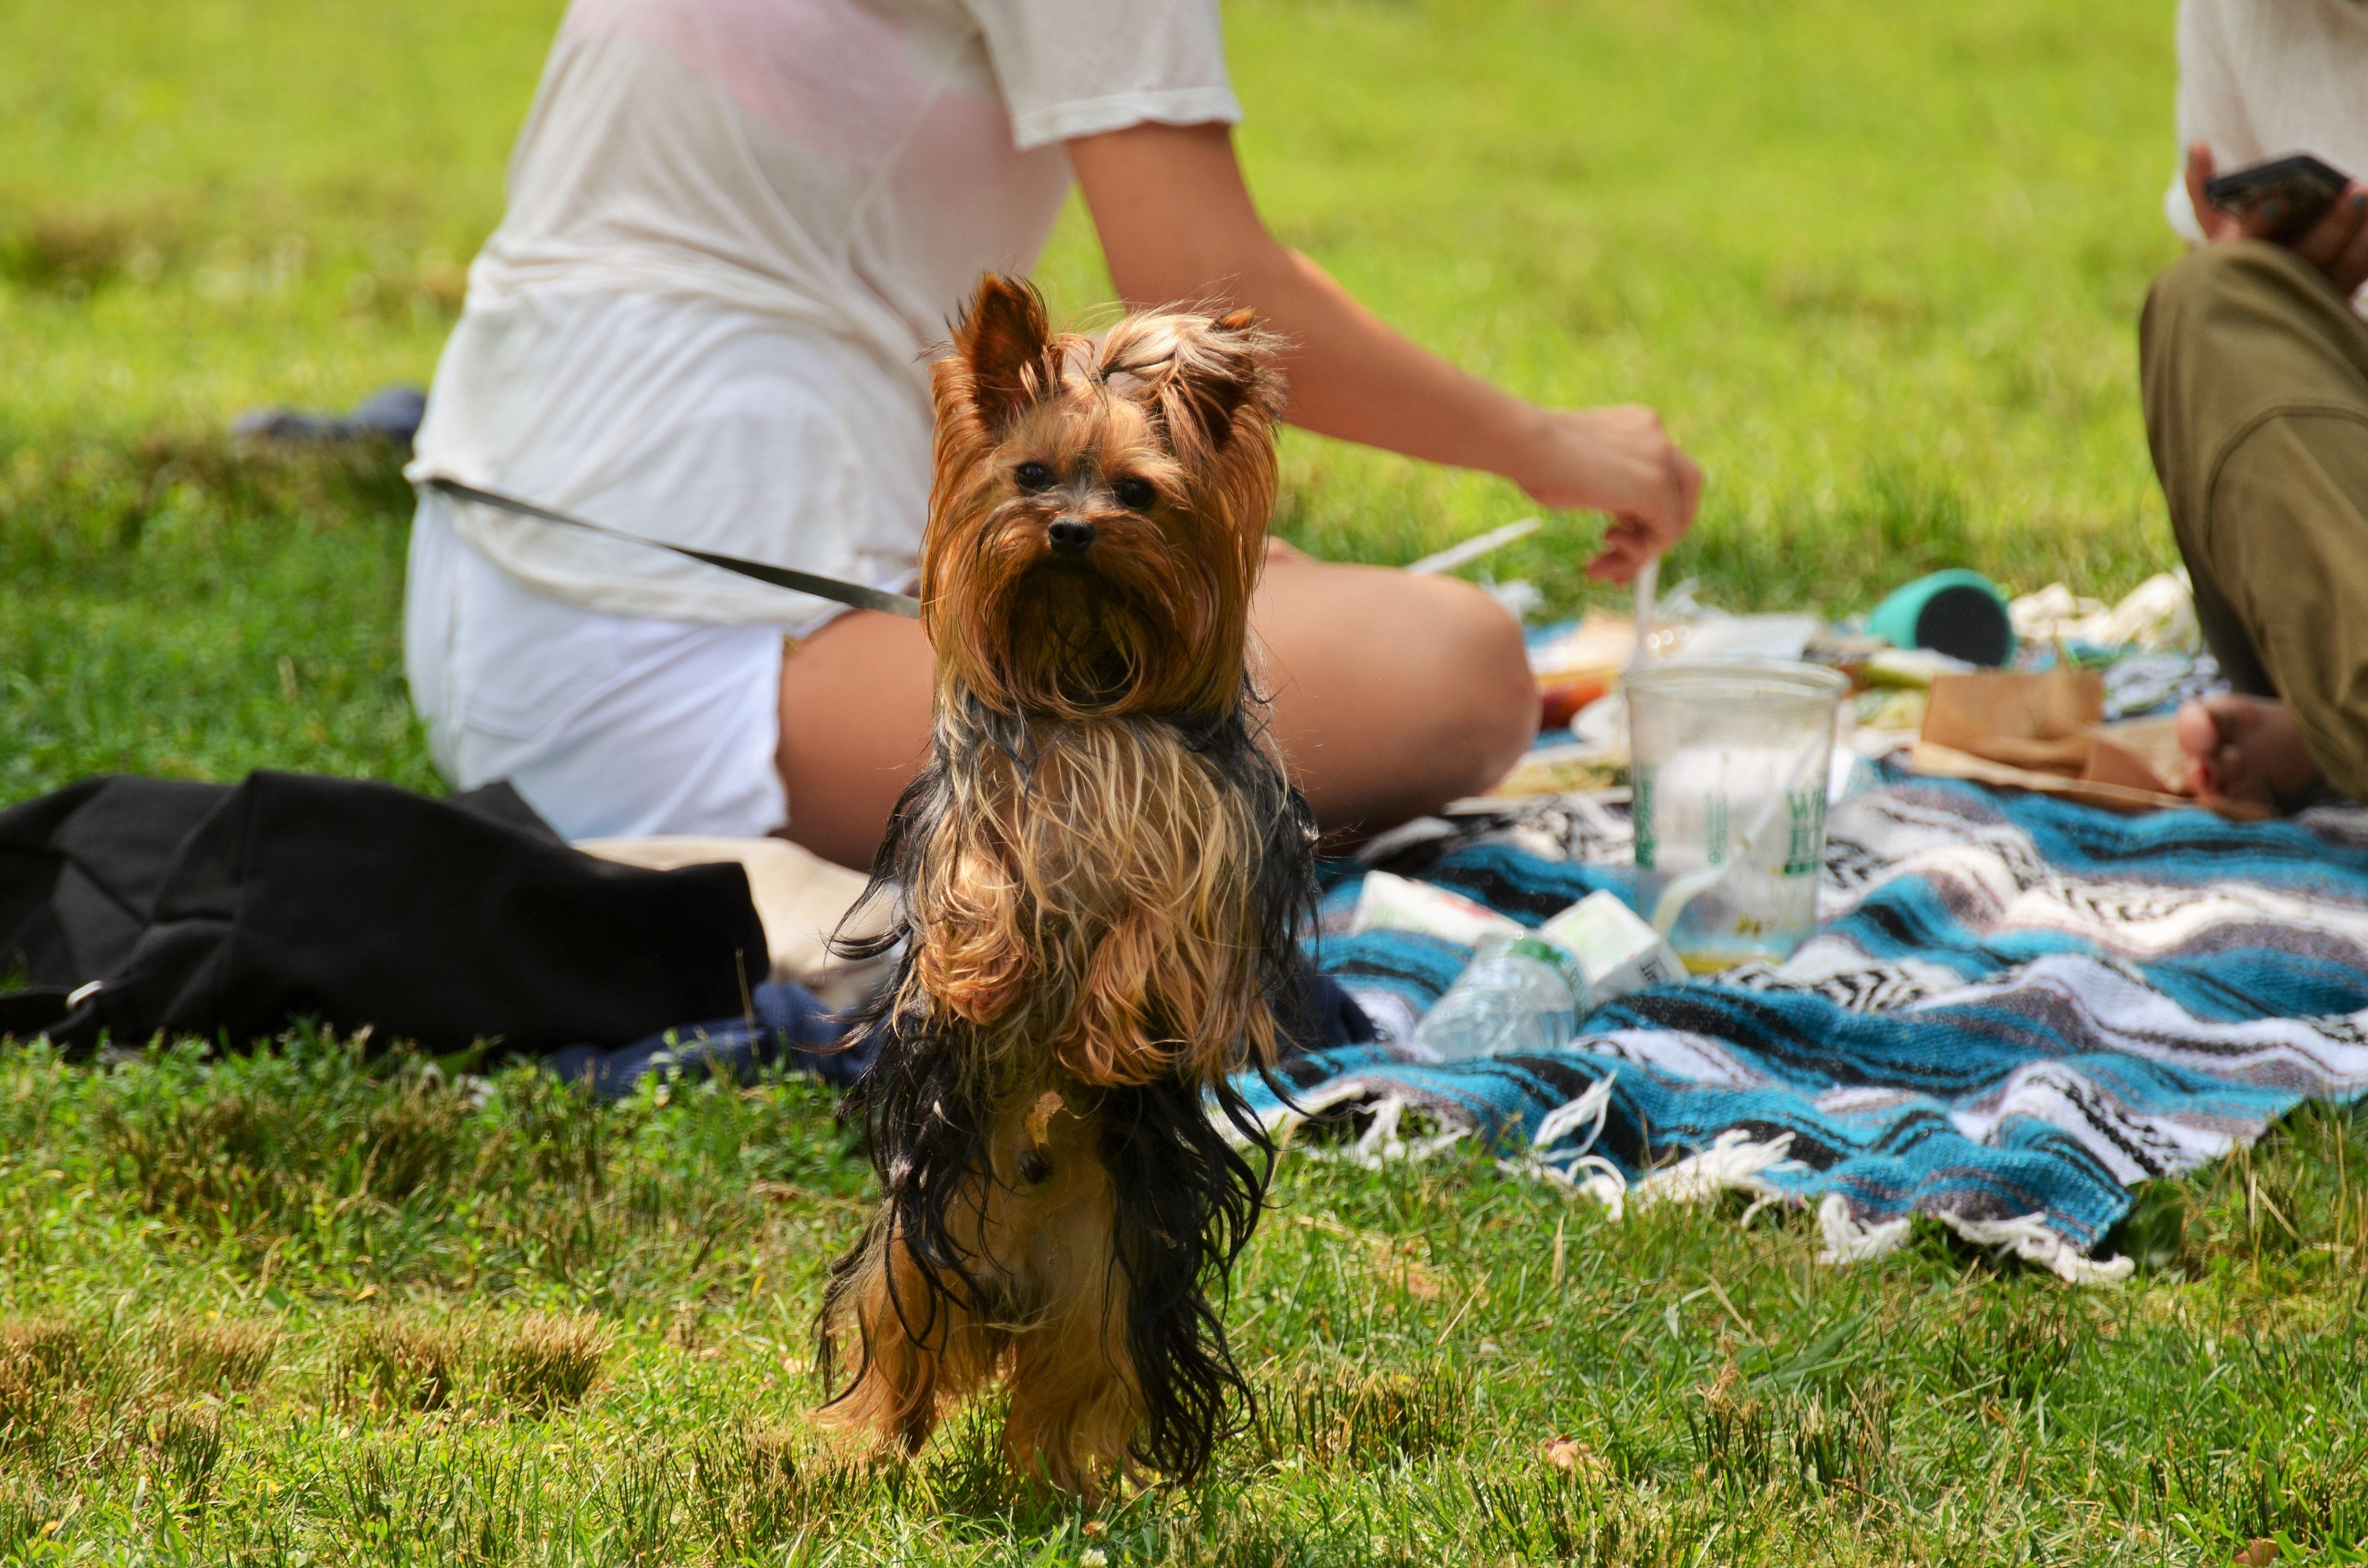 gratis afbeeldingen gras new york zomer ontbijt centrale park picknick yorkshire dieren. Black Bedroom Furniture Sets. Home Design Ideas